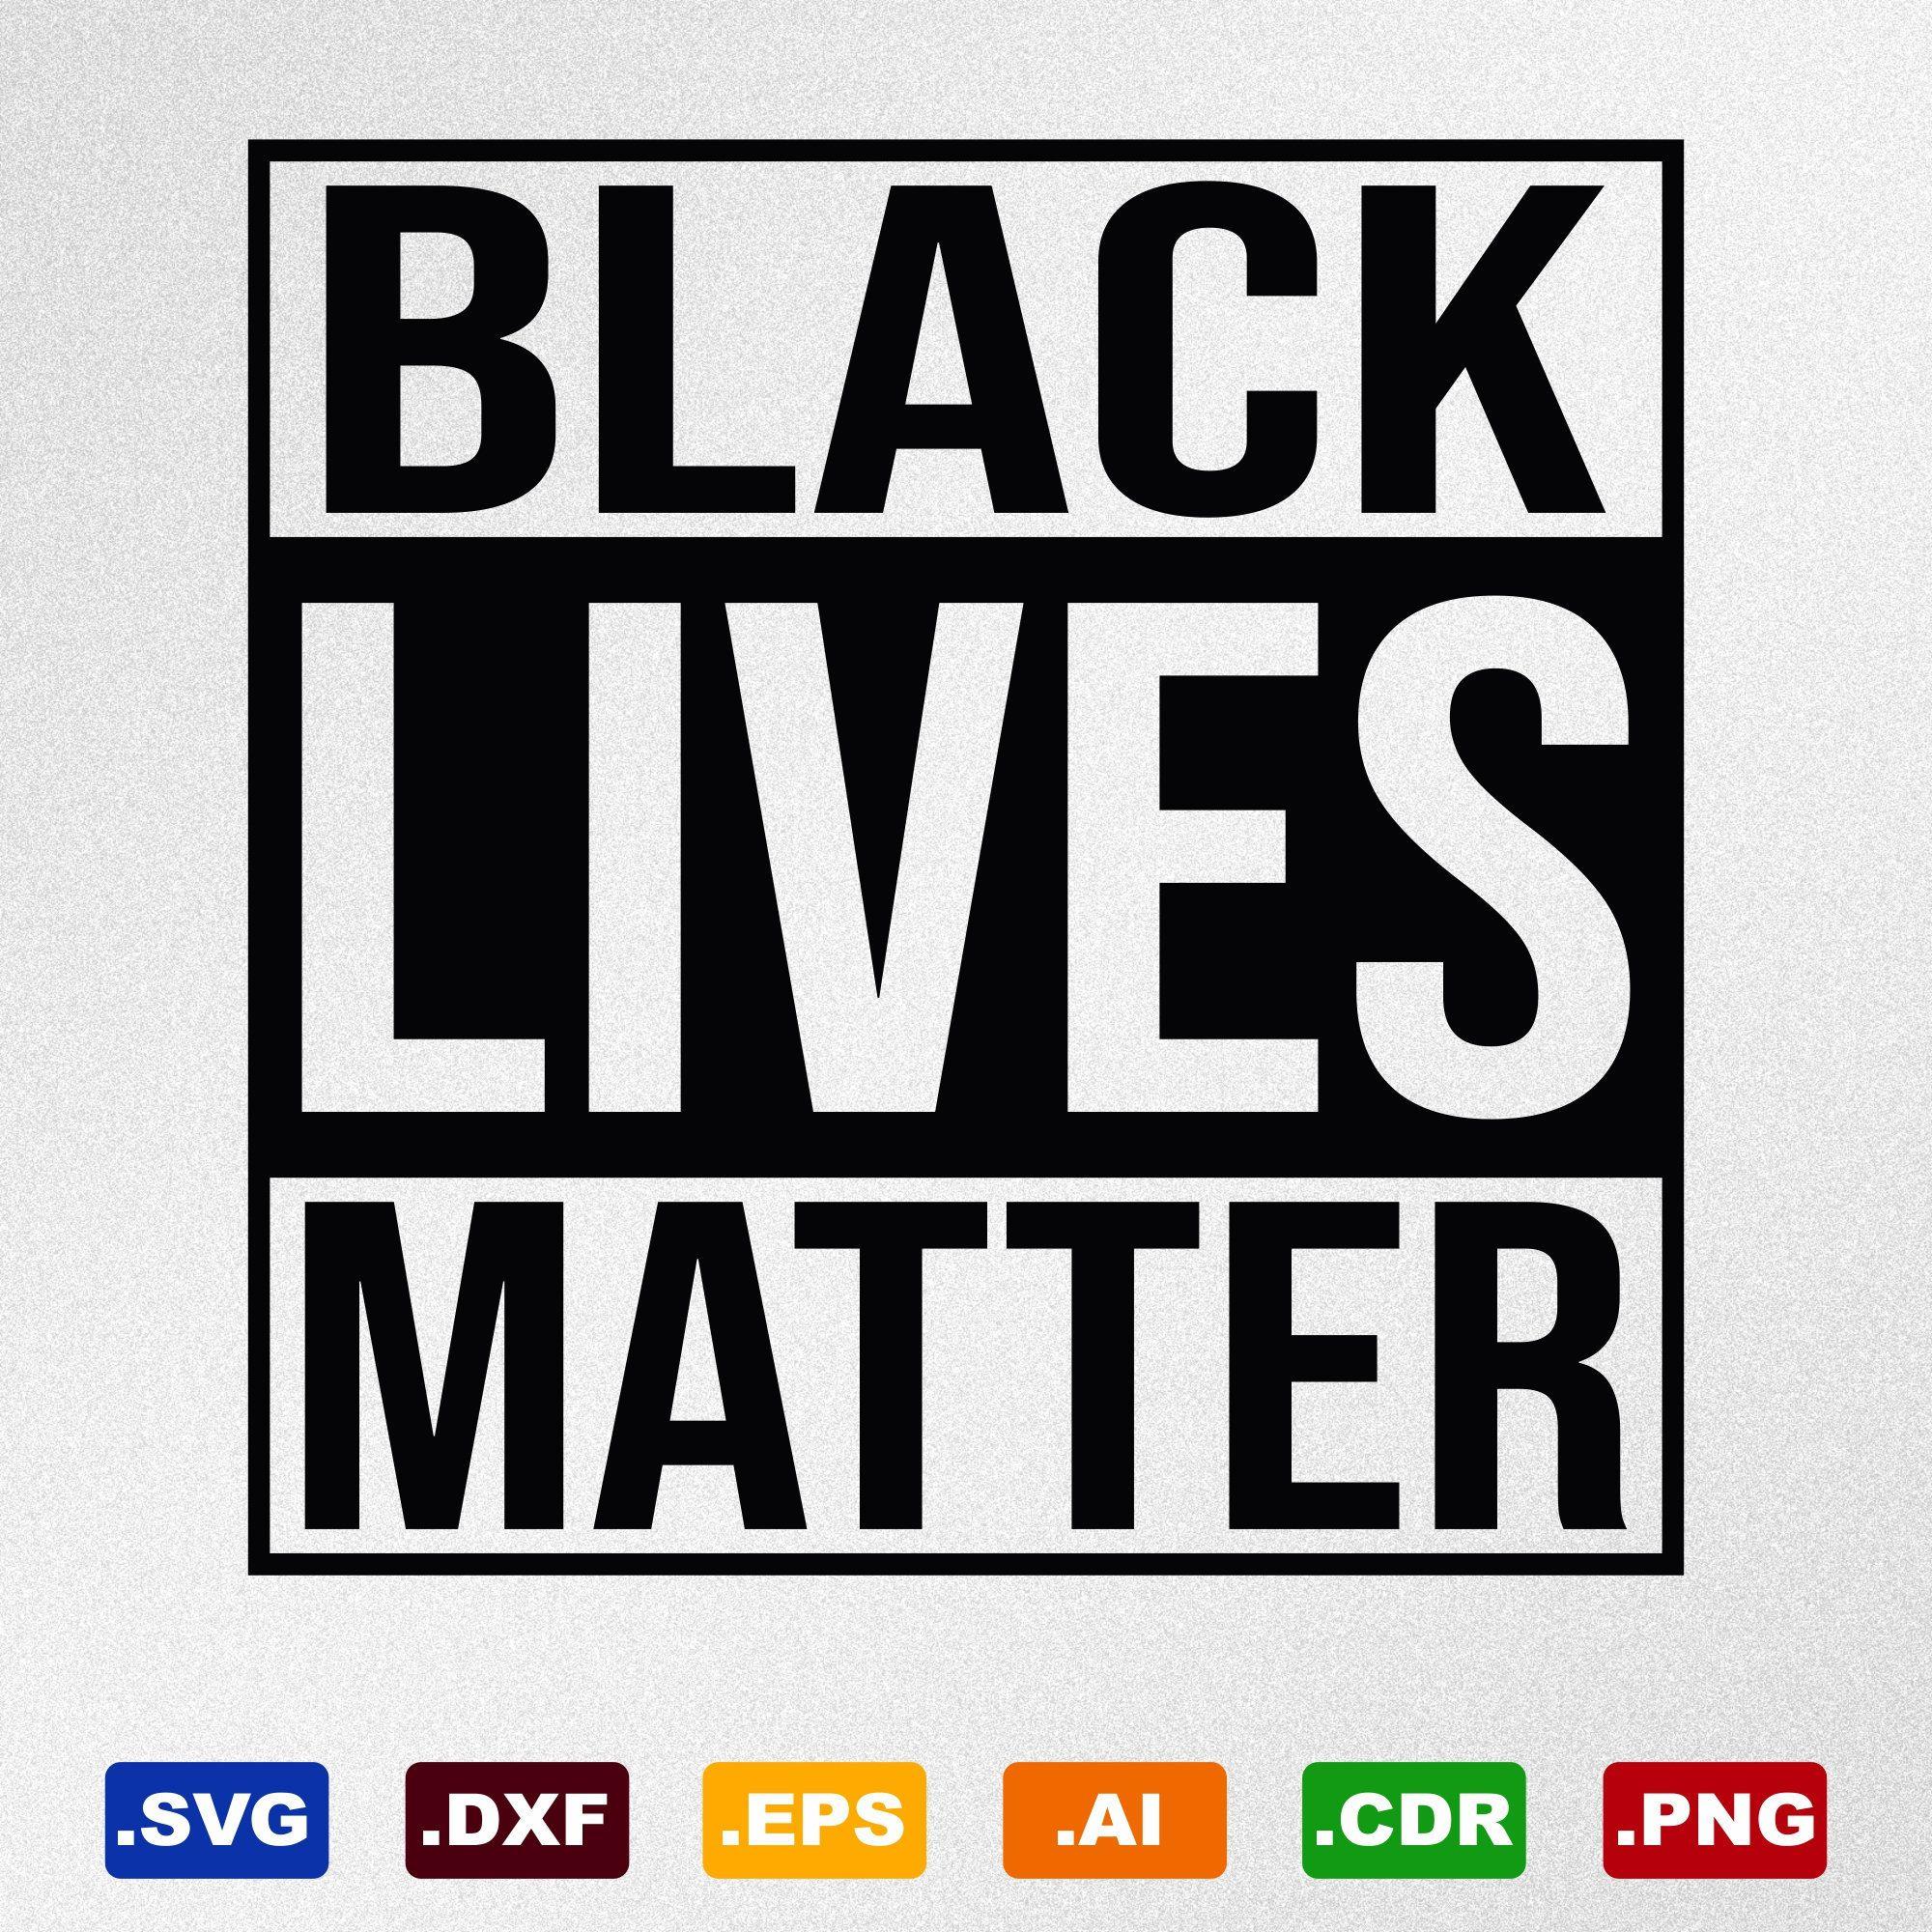 Black Lives Matter Svg Dxf Eps Ai Cdr Vector Files for